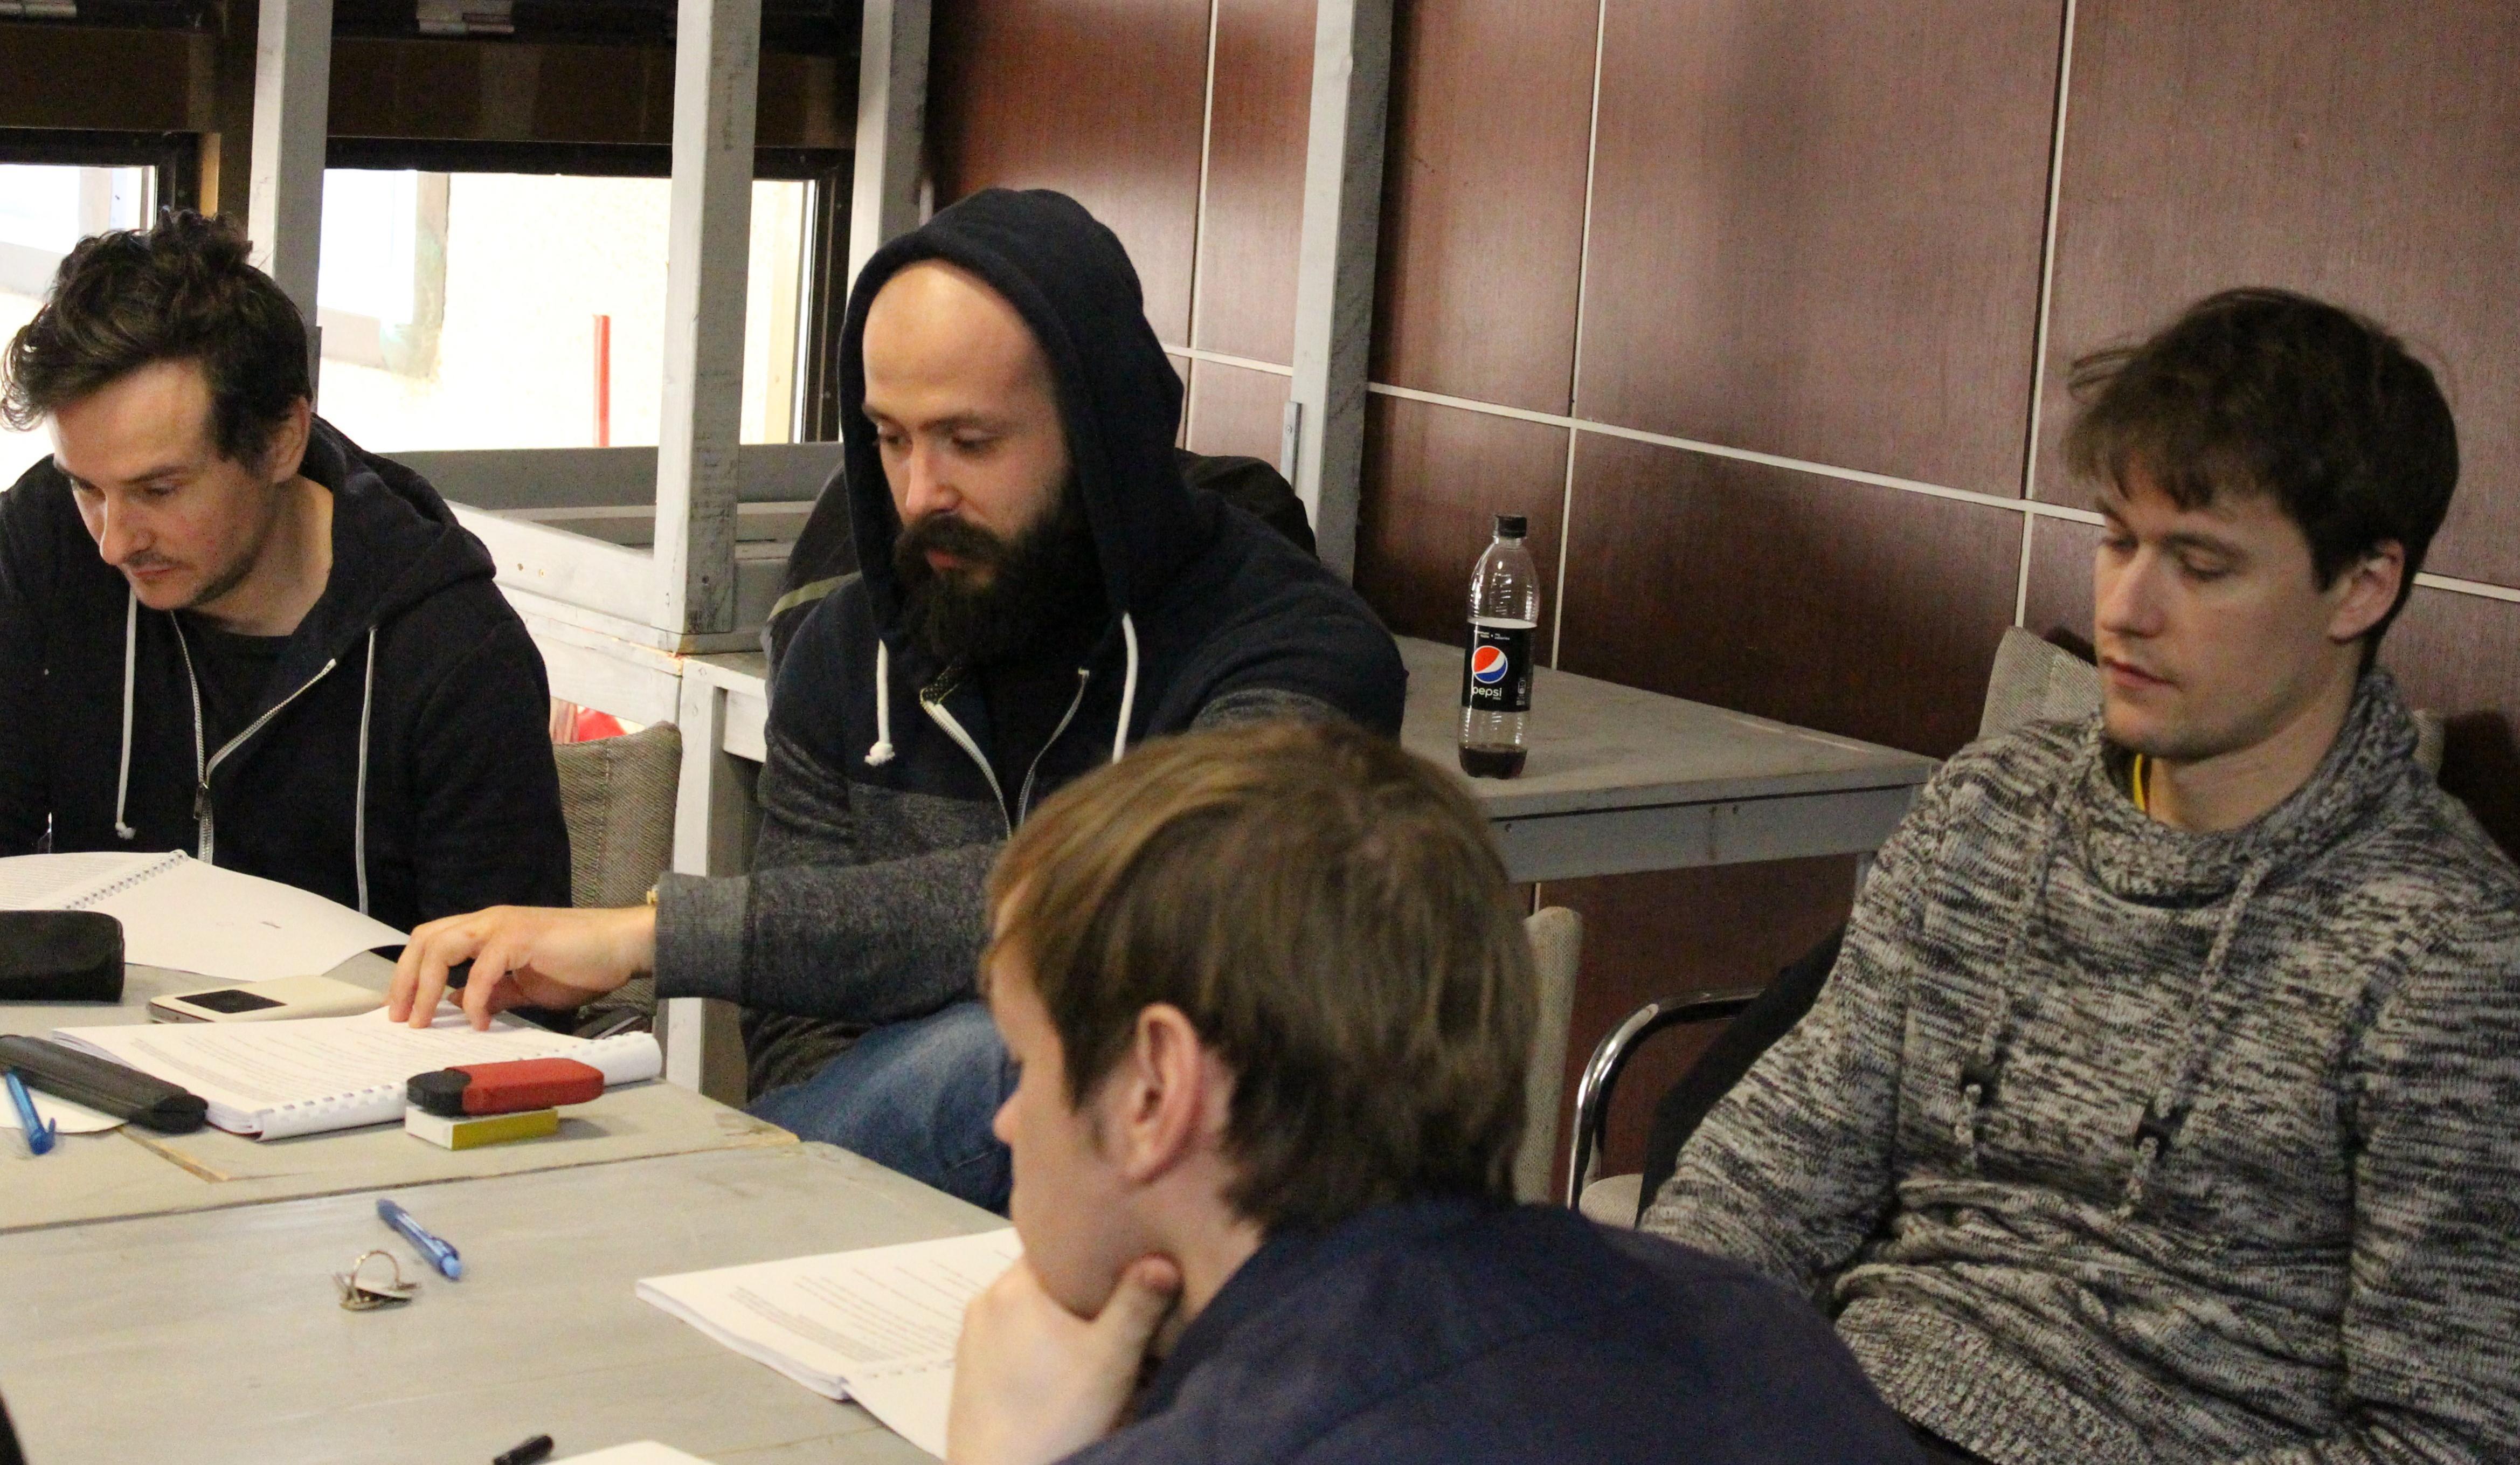 Peter Oszlik, Daniel Ratimorsky, Juraj Duris, Andrej Remenik